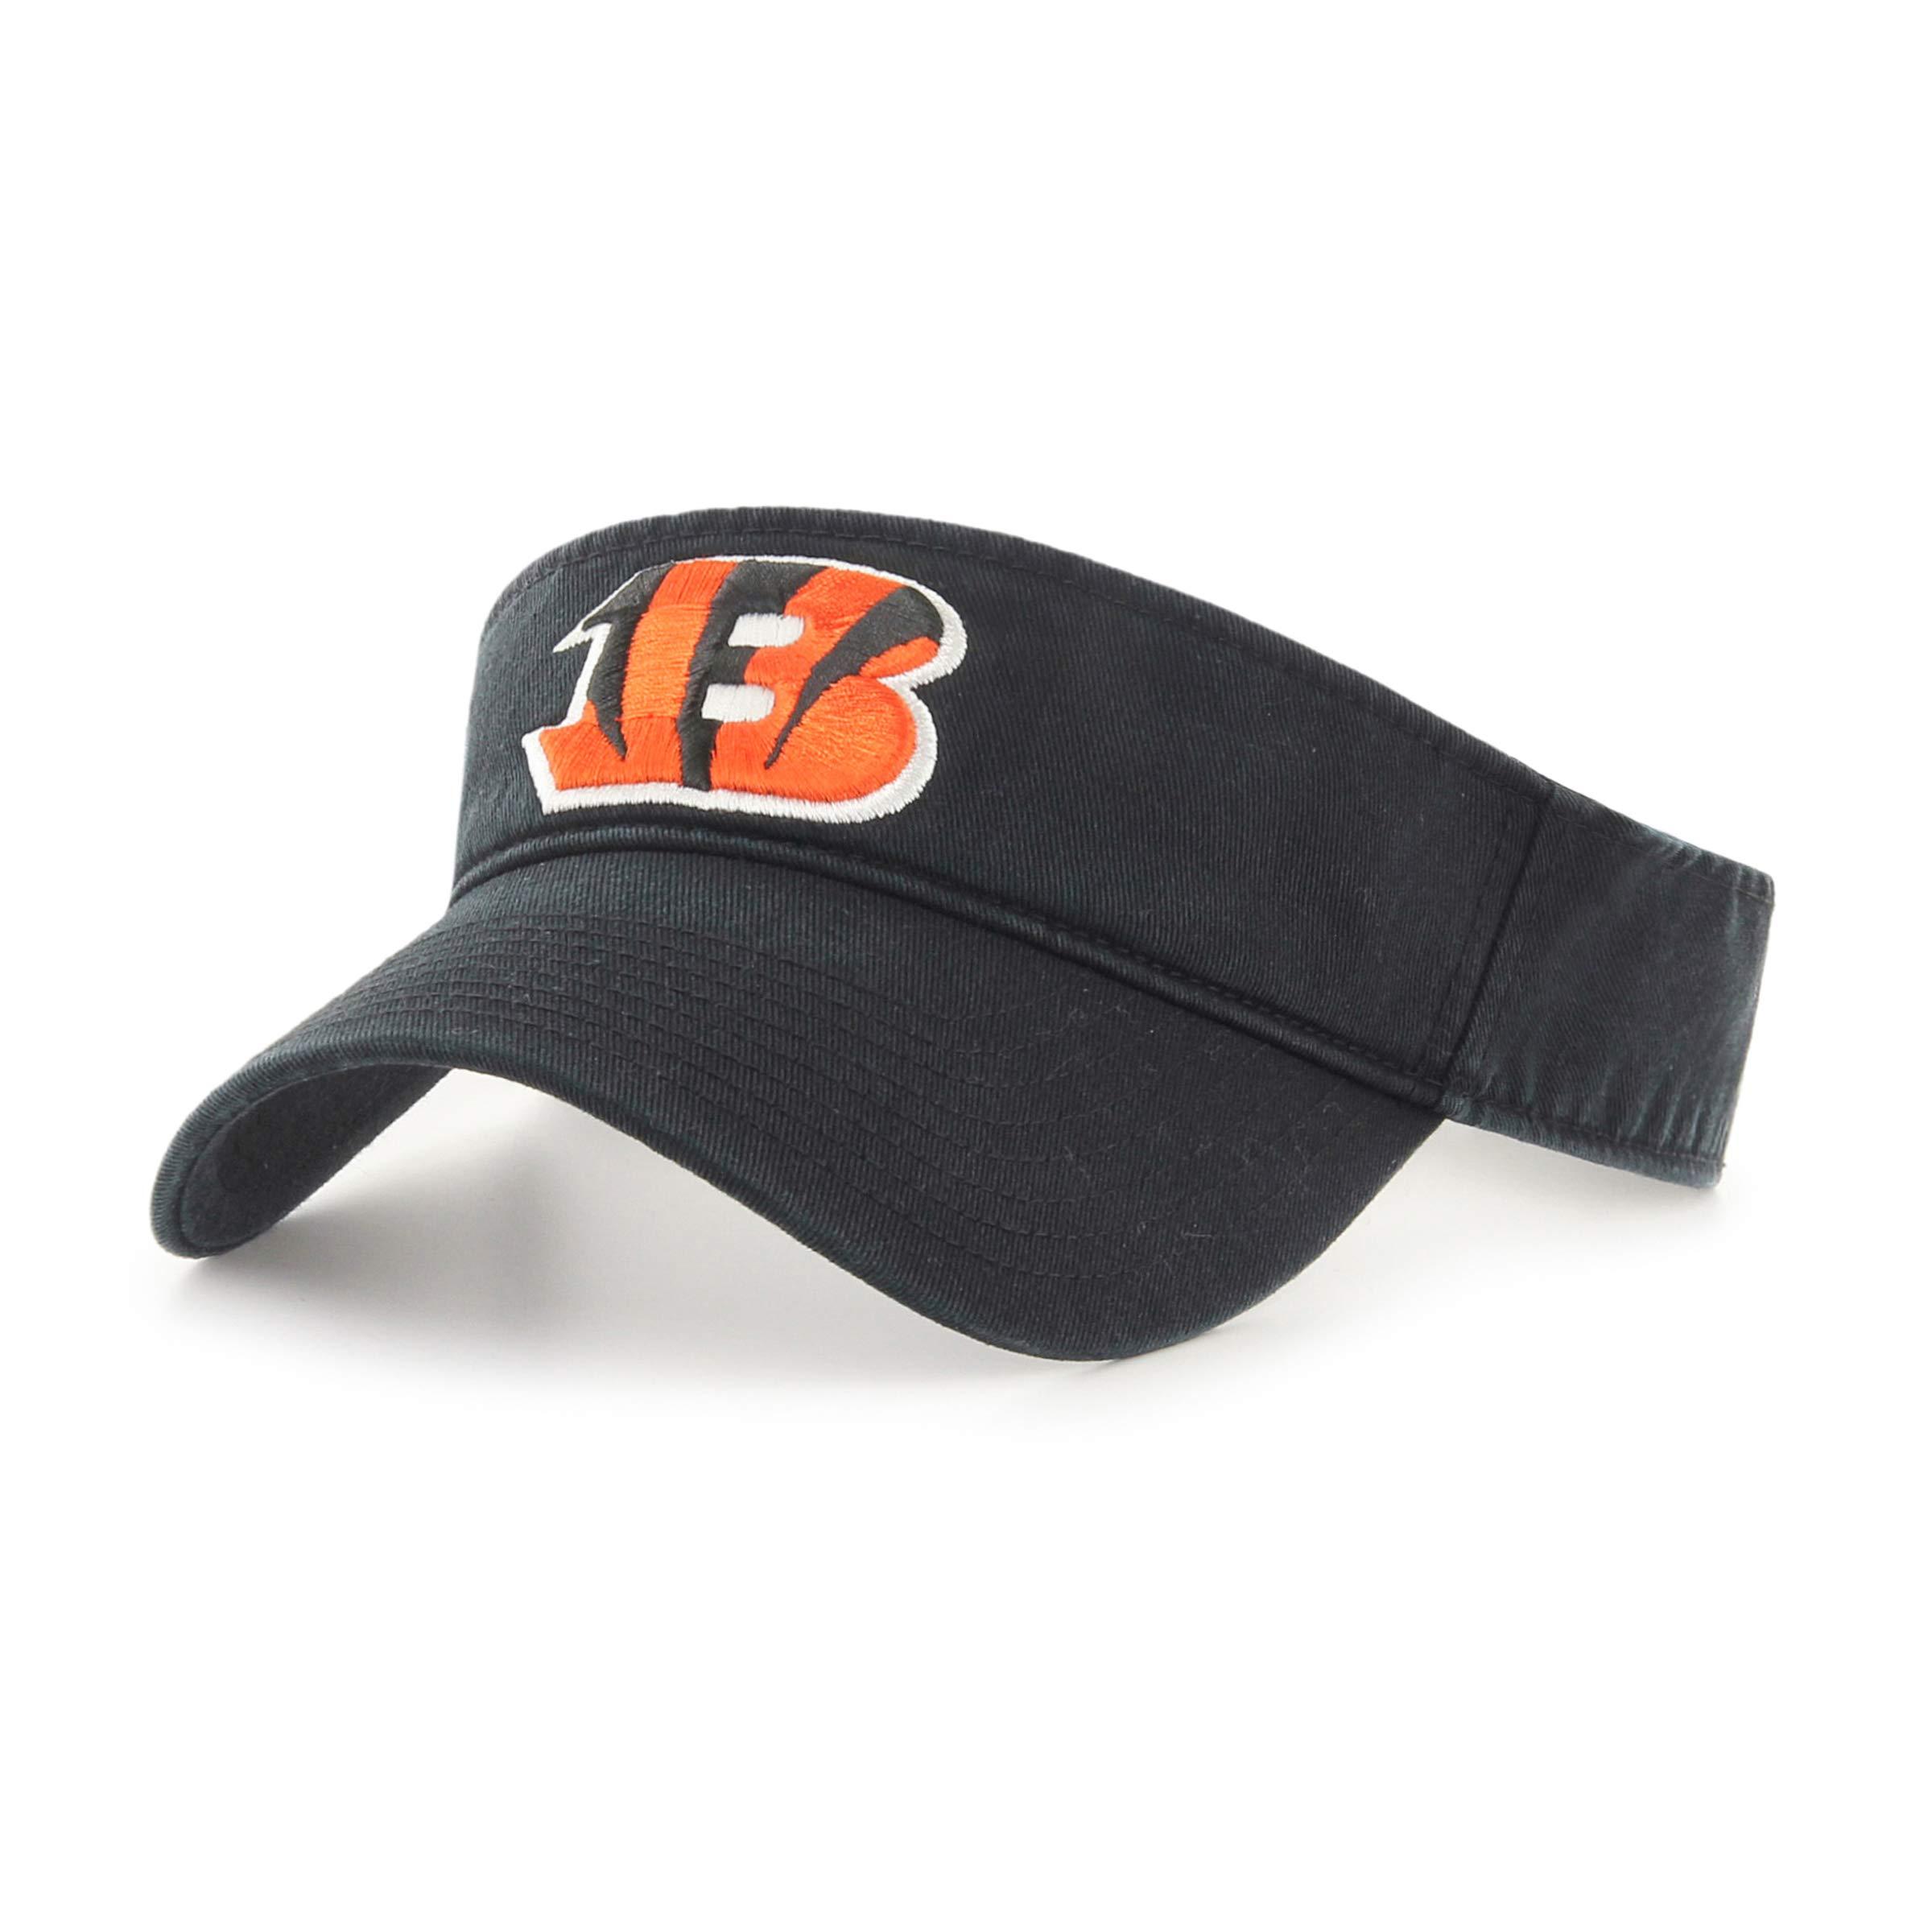 OTS NFL Cincinnati Bengals Male Visor, Black, One Size